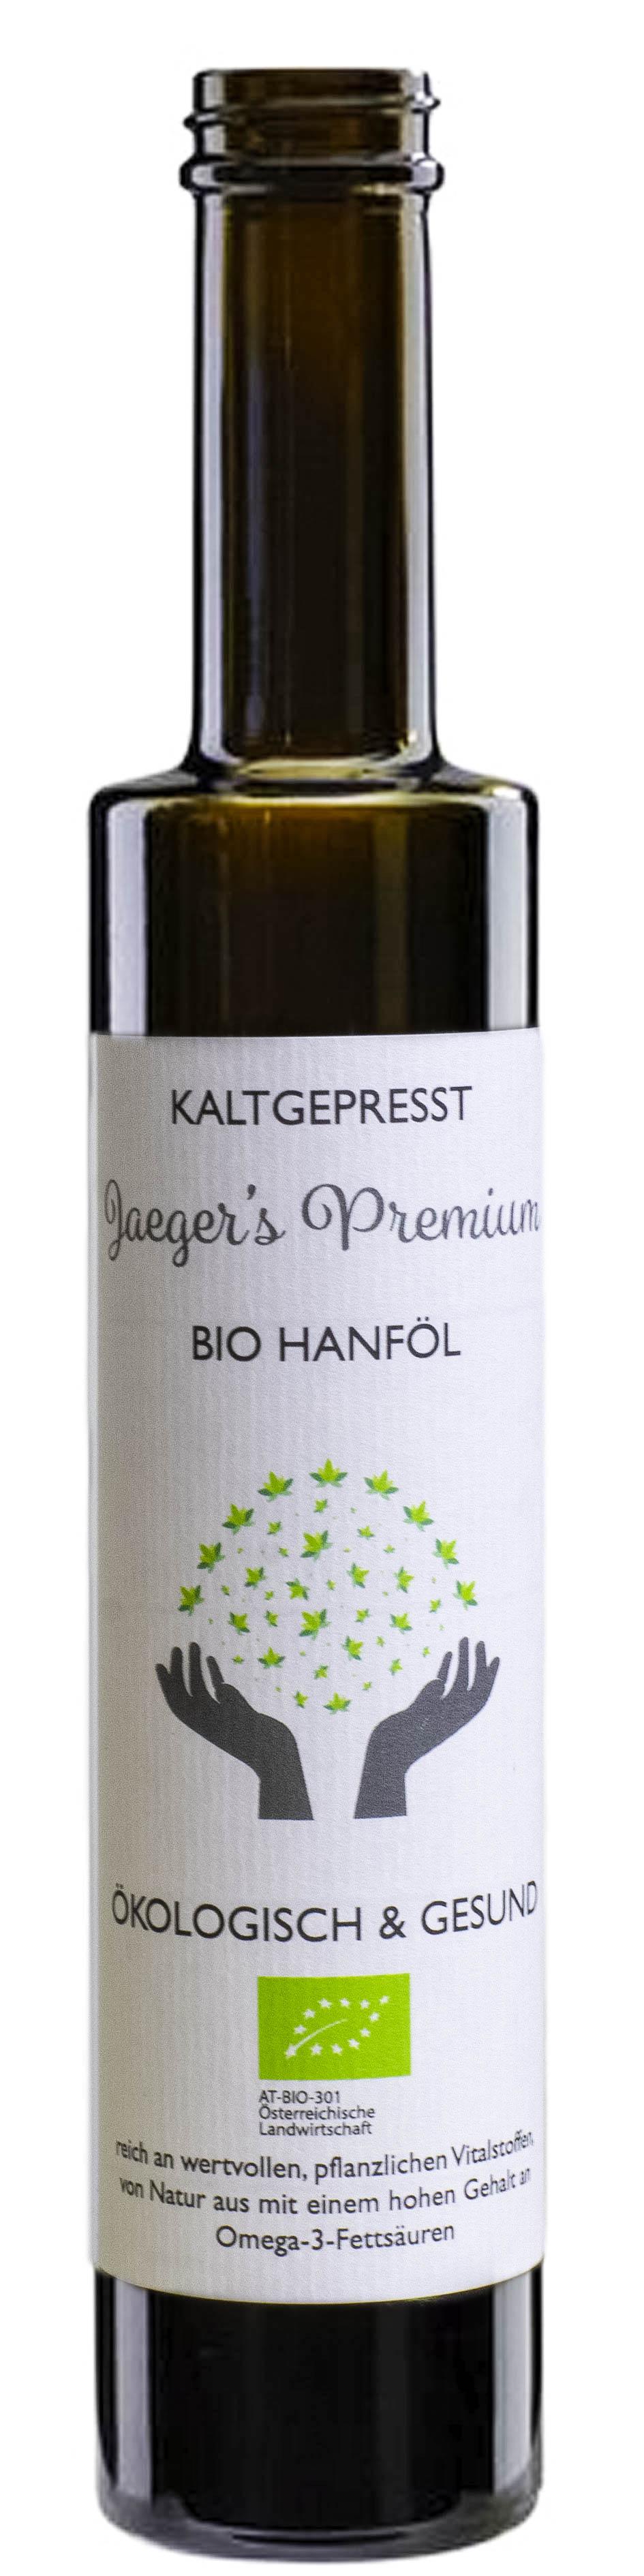 hanföl bio jaeger premium hemp oil